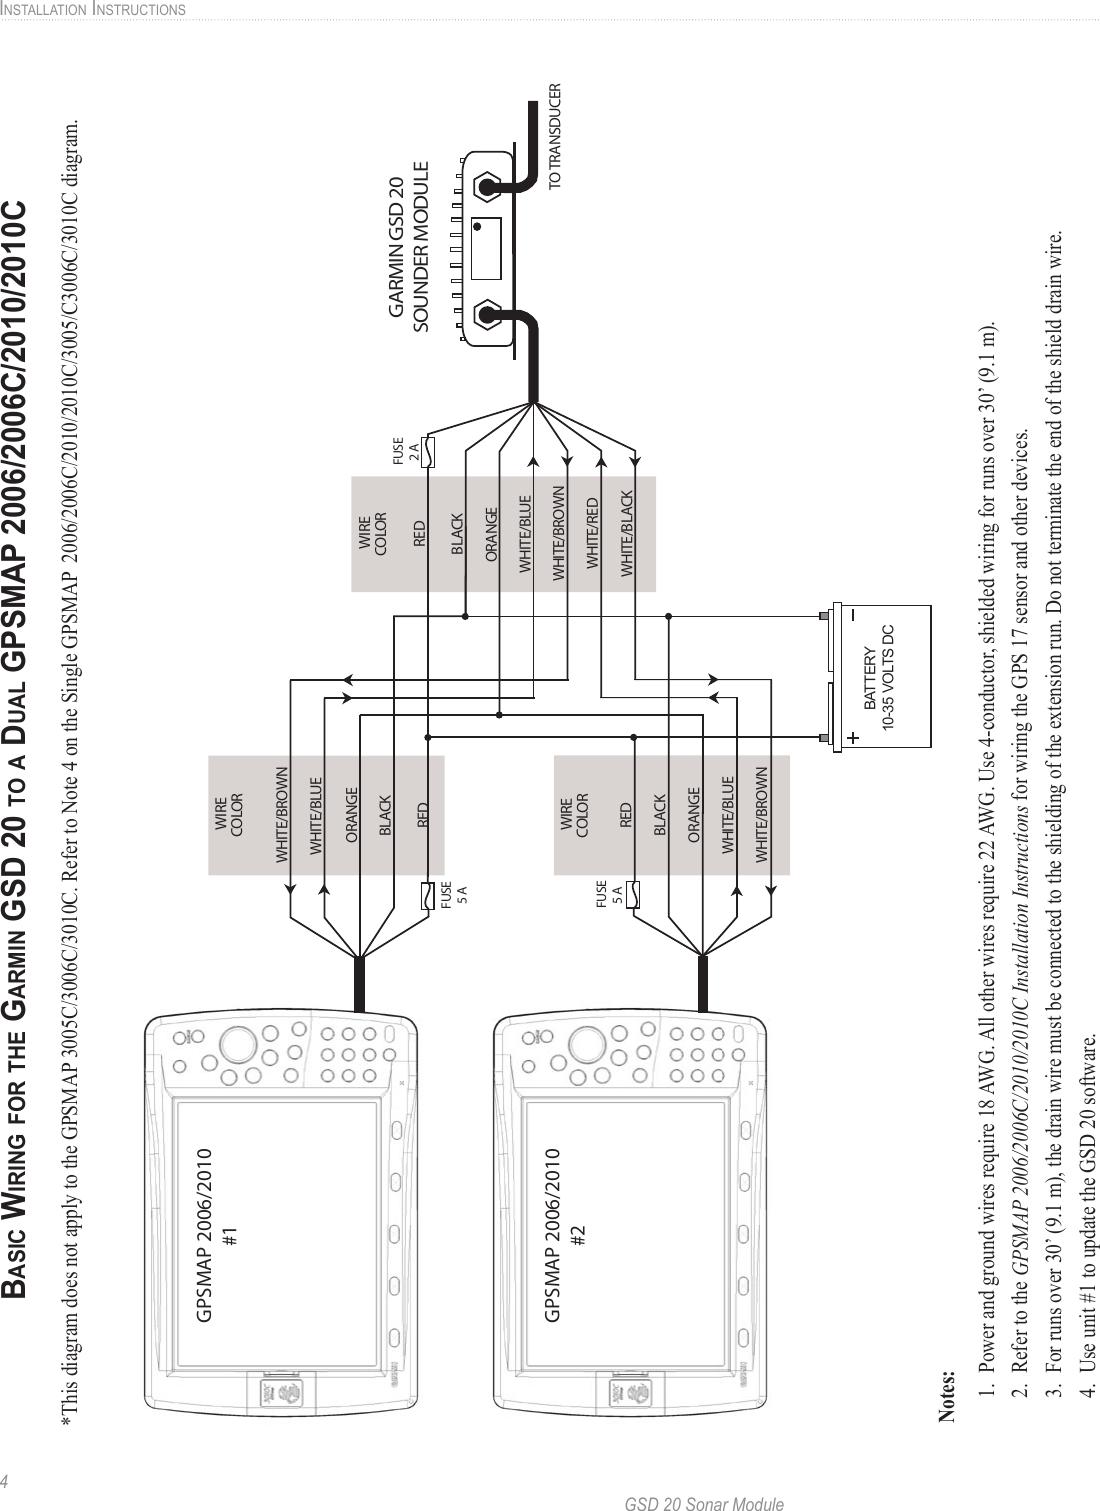 Garmin 536 M Gsd 20 Manual Installation Guide 190 00255 00_0E on